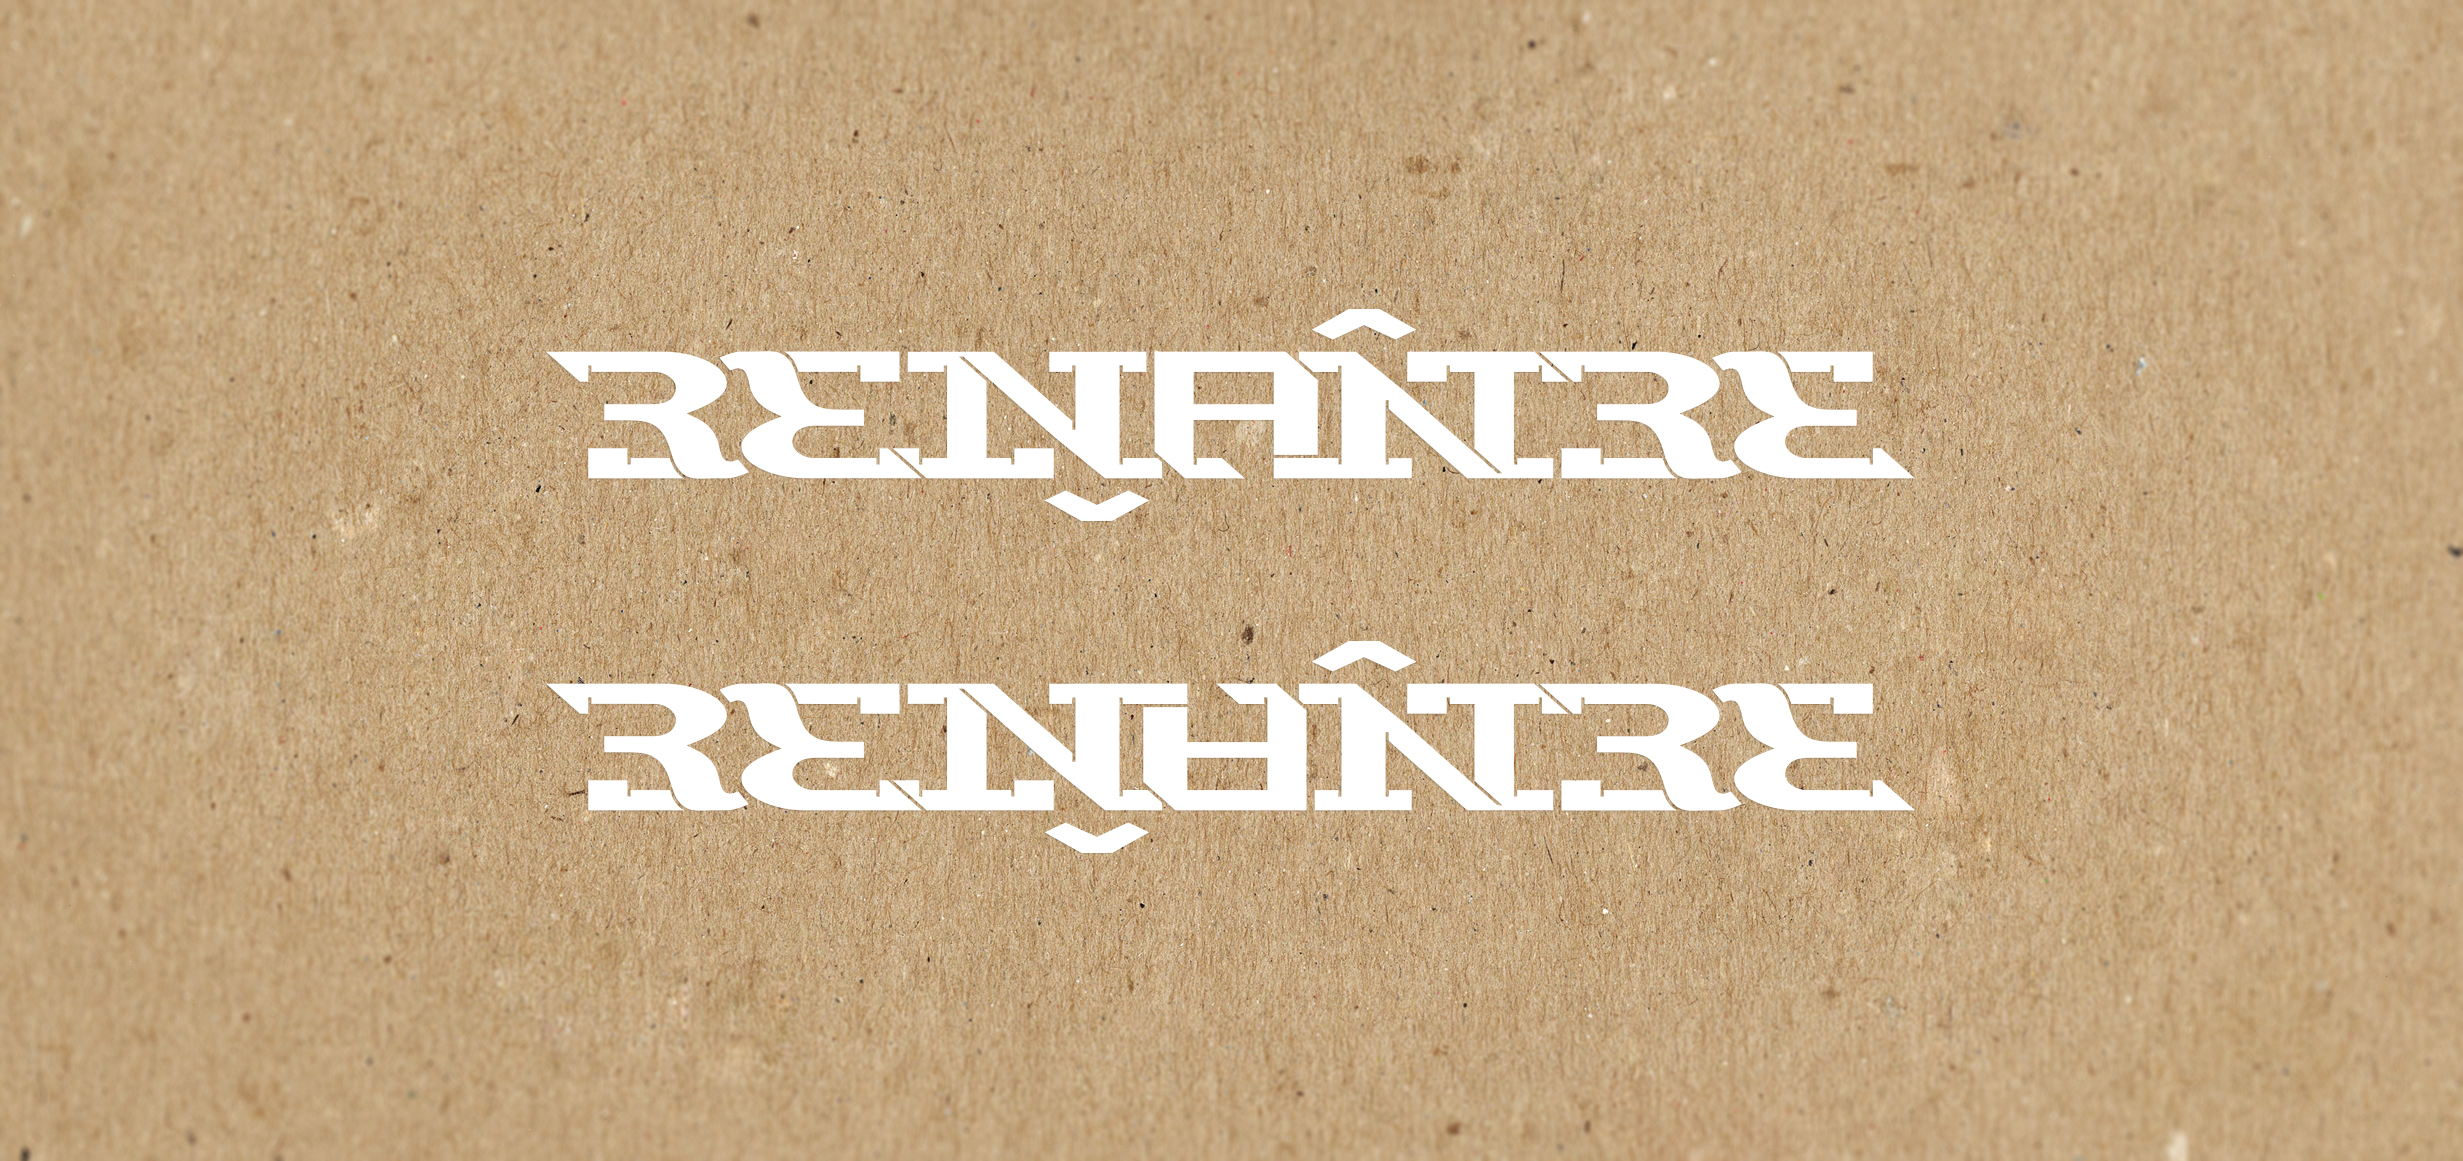 Ambigram logo design with handmade slab serif type.